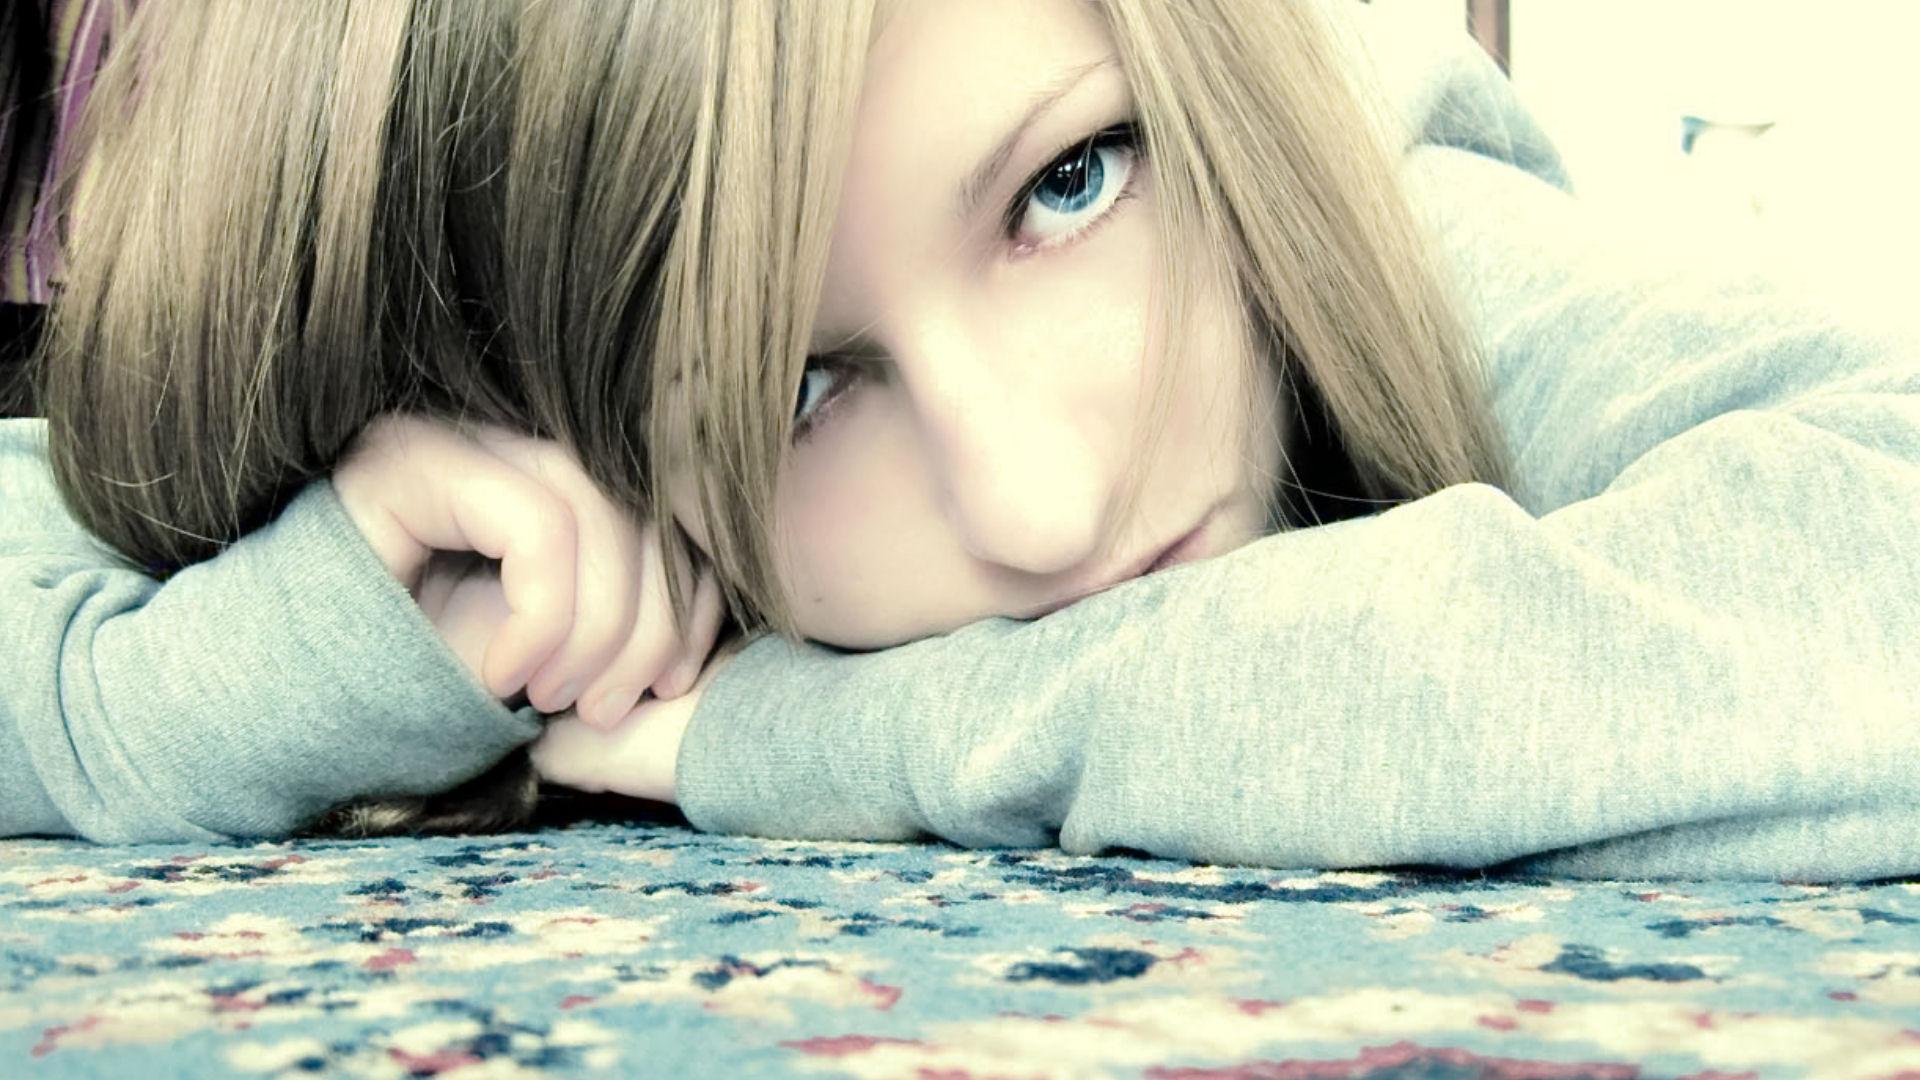 Sad Girl Wallpaper For Facebook Photography Click As Your Mod 1920x1080